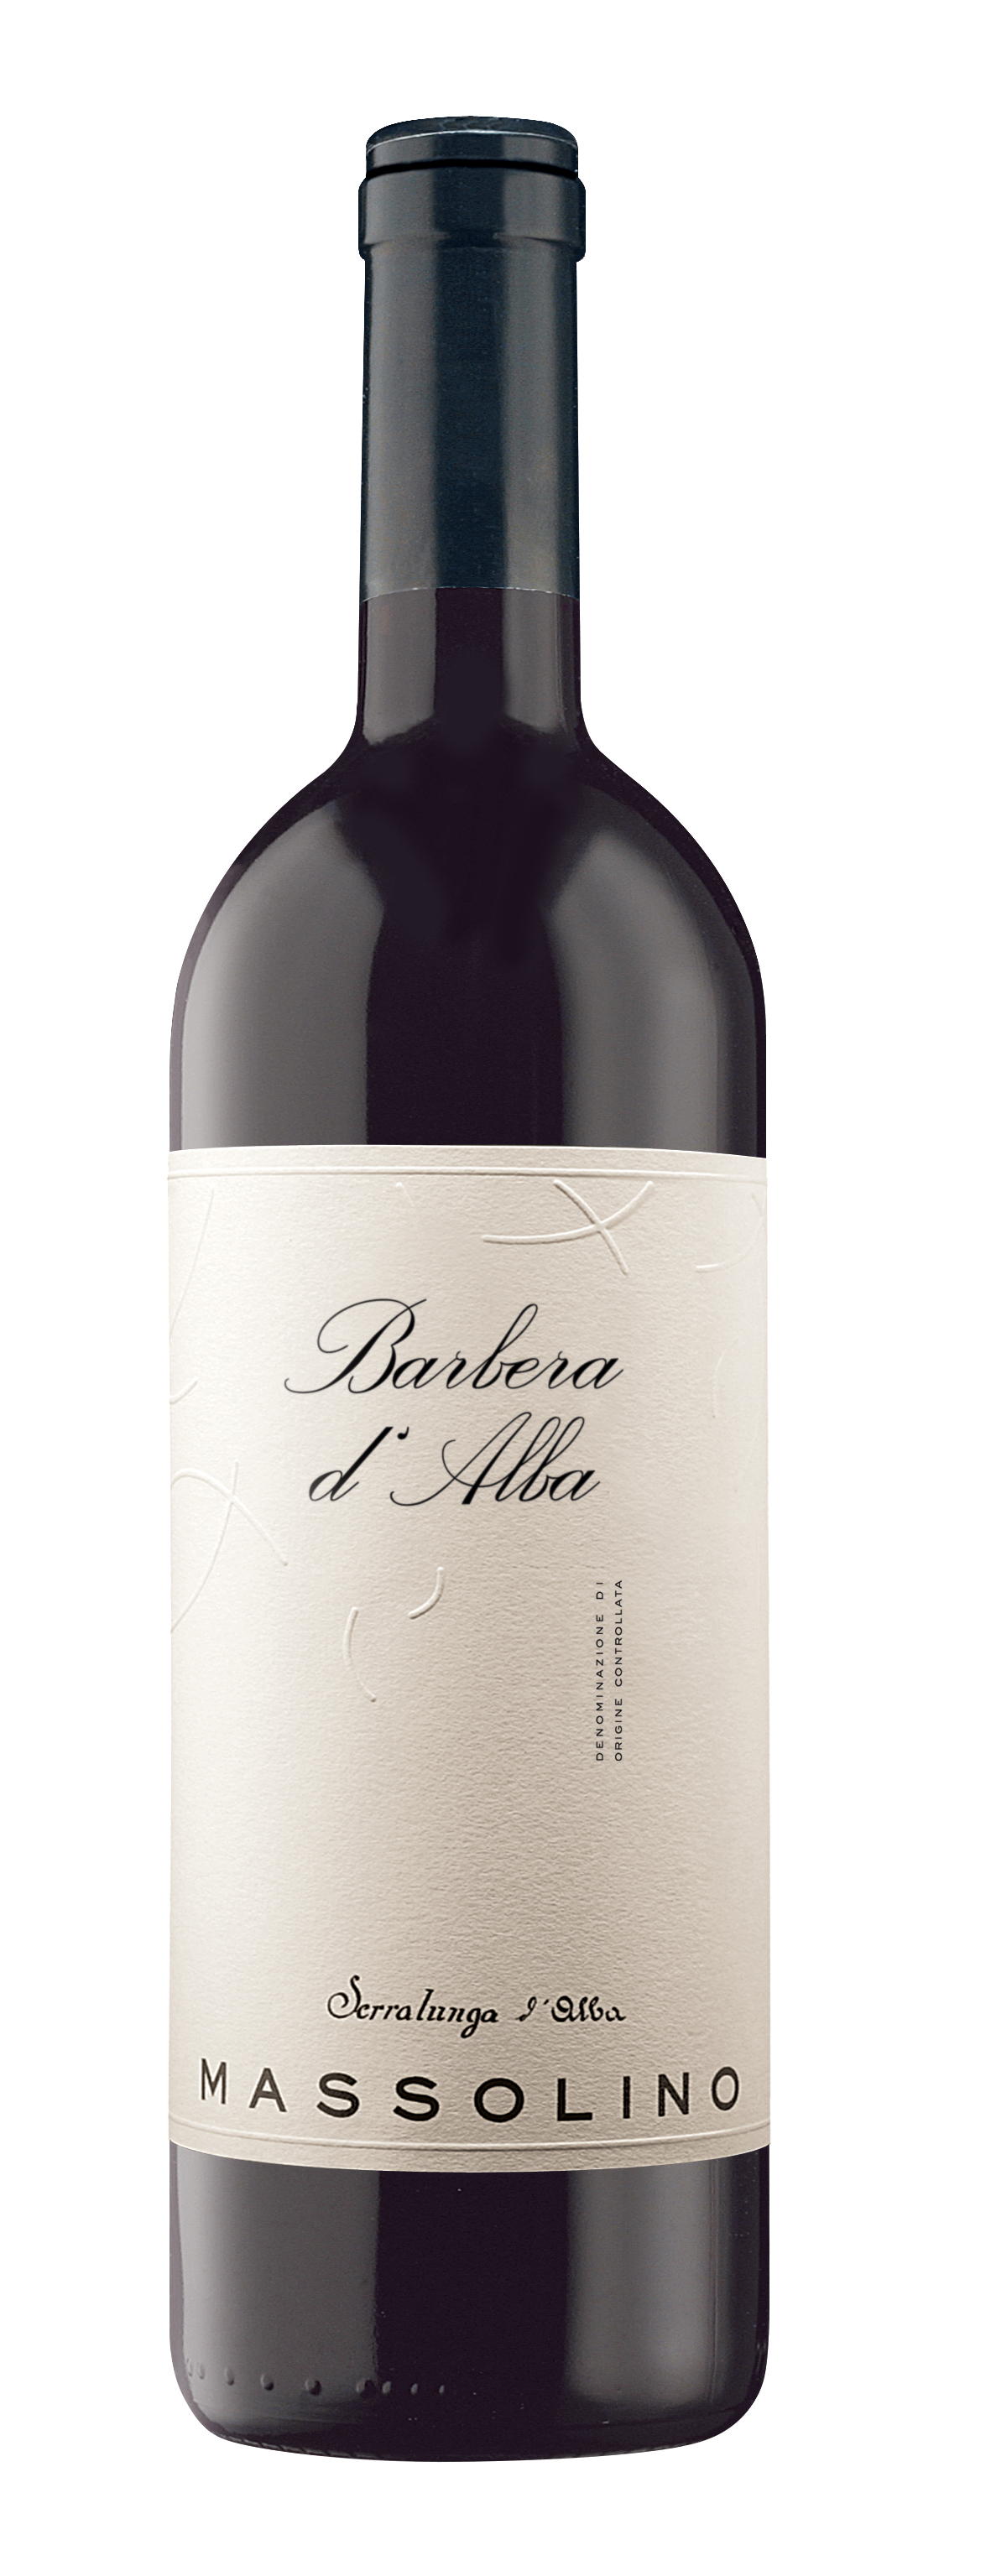 Massolino Barbera d'Alba Bottle.jpg